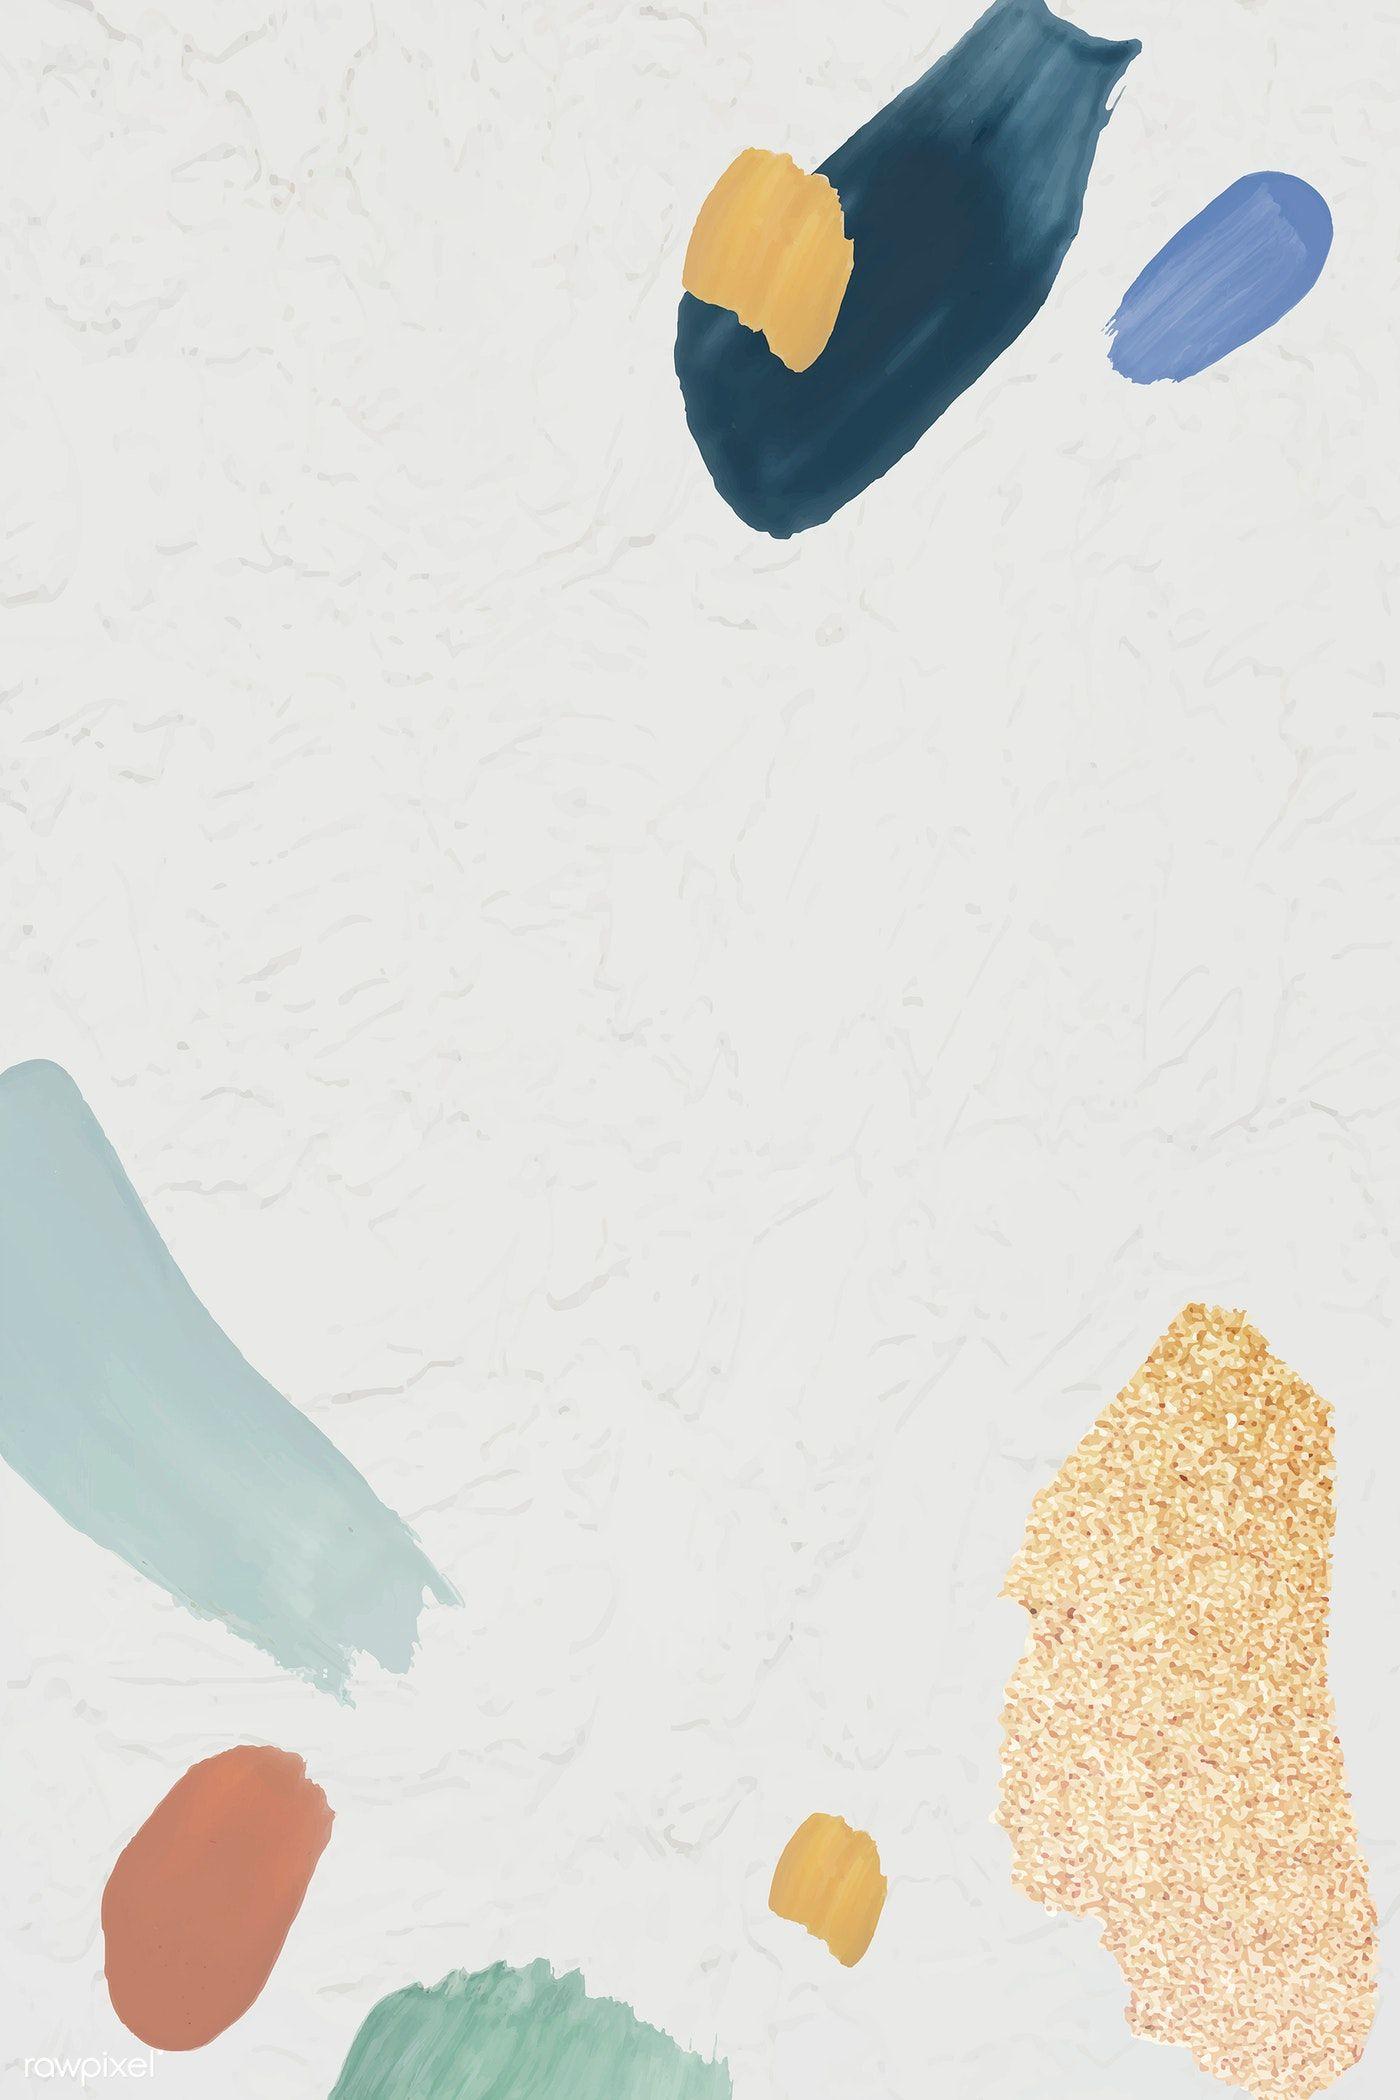 Download premium vector of Blank abstract design element